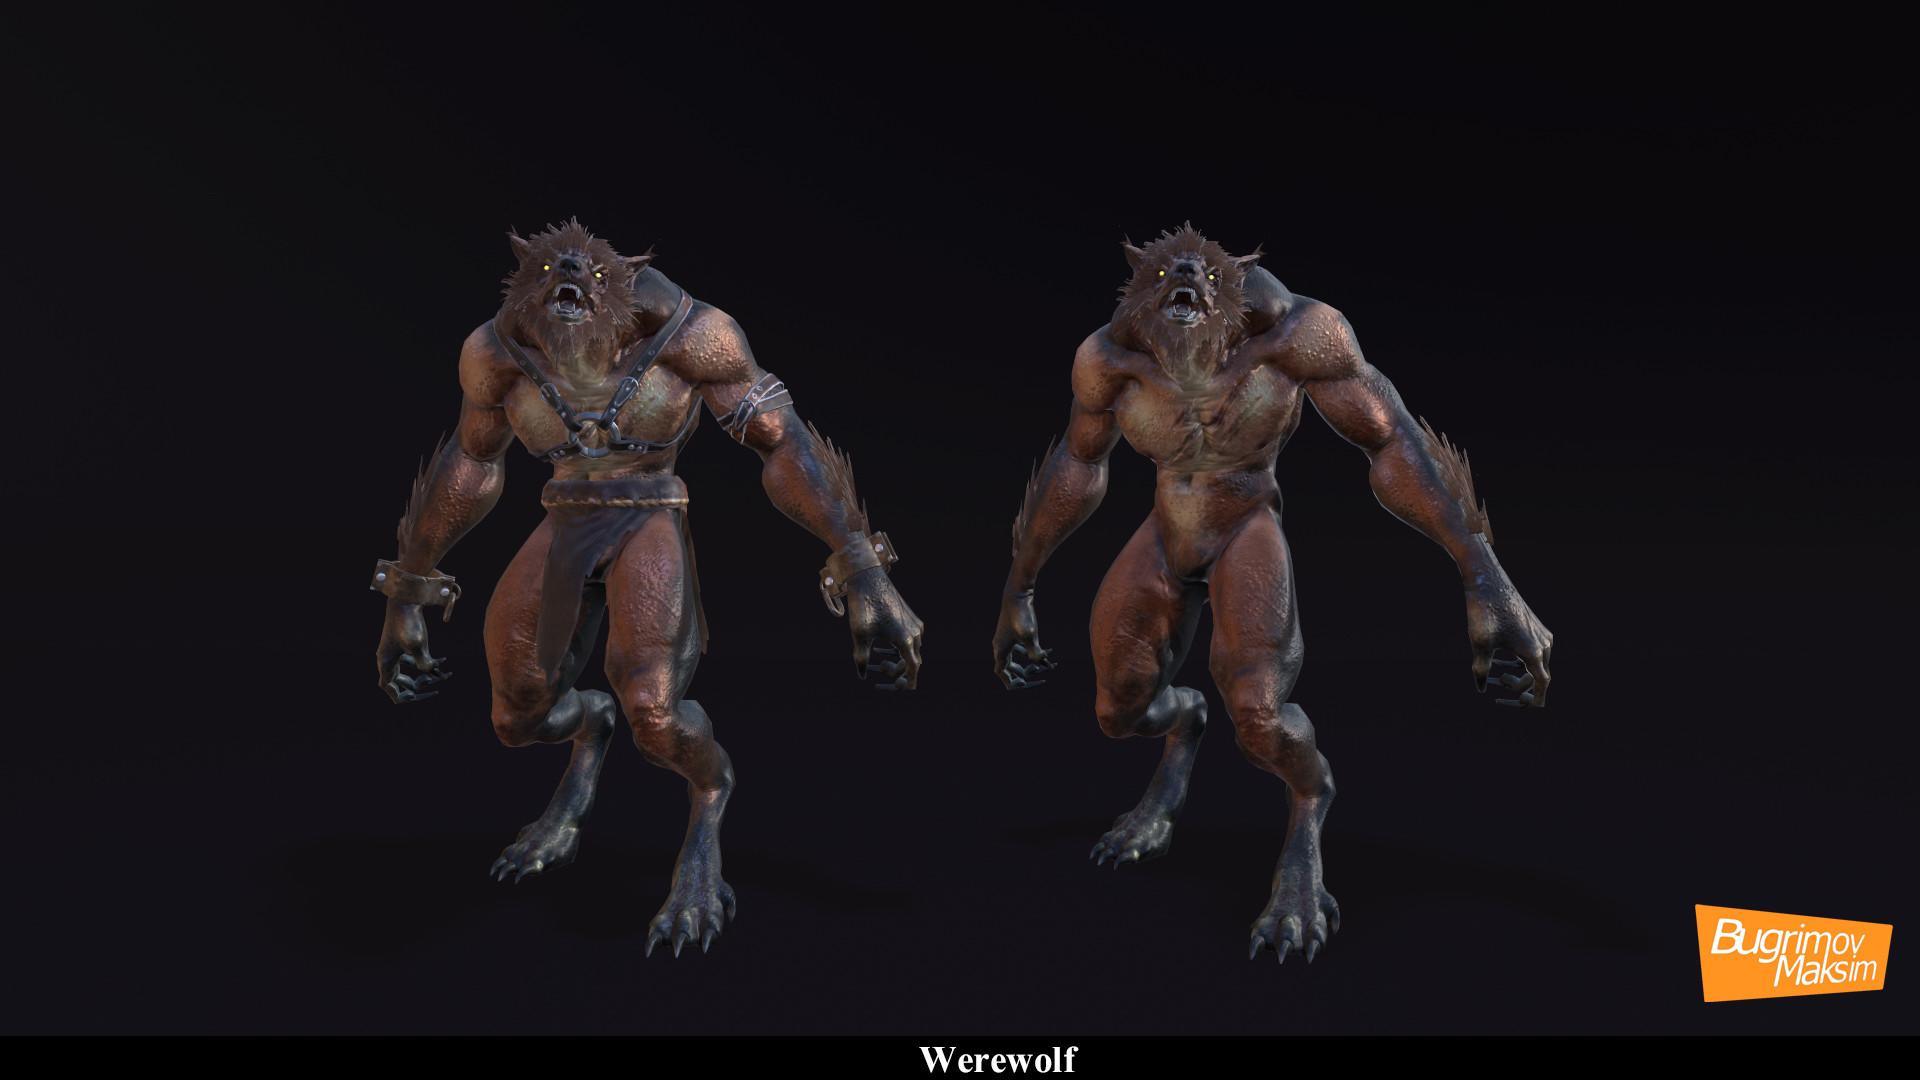 3d warewolf three way erotica tube